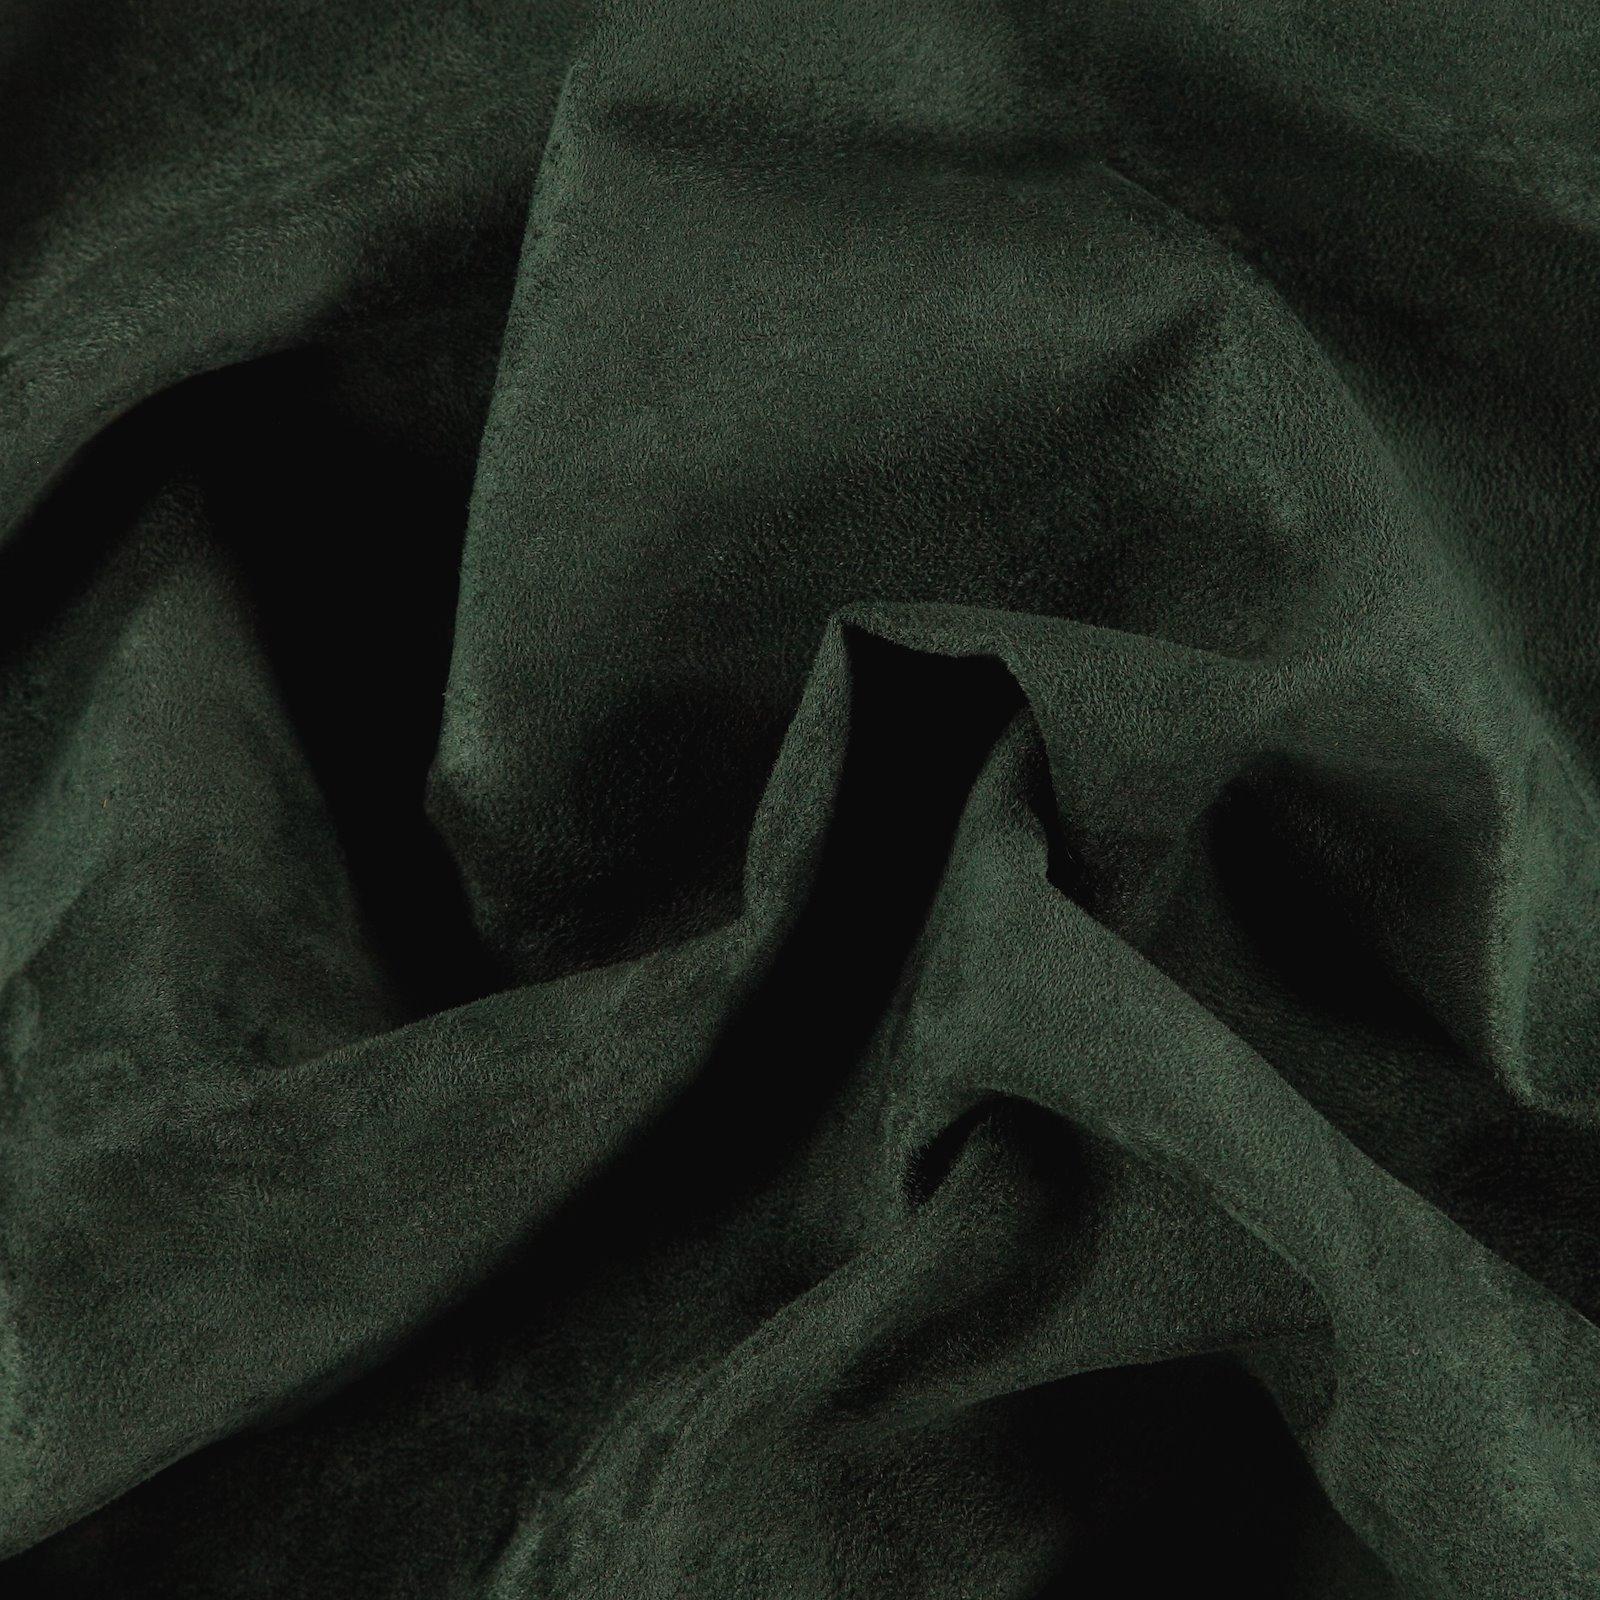 Upholstery fake suede dark bottle green